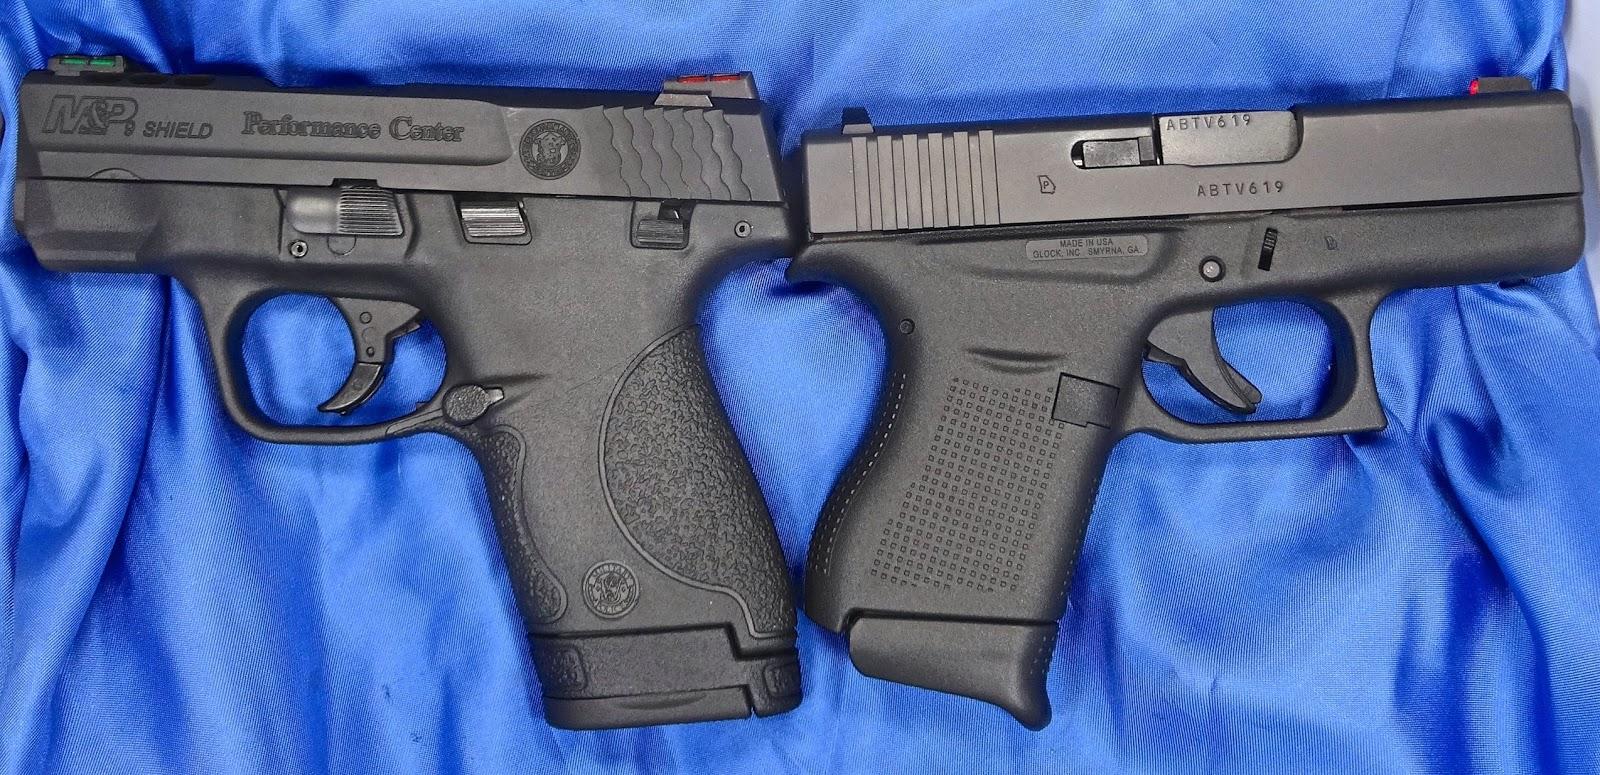 average joe s handgun reviews performance center s w shield versus